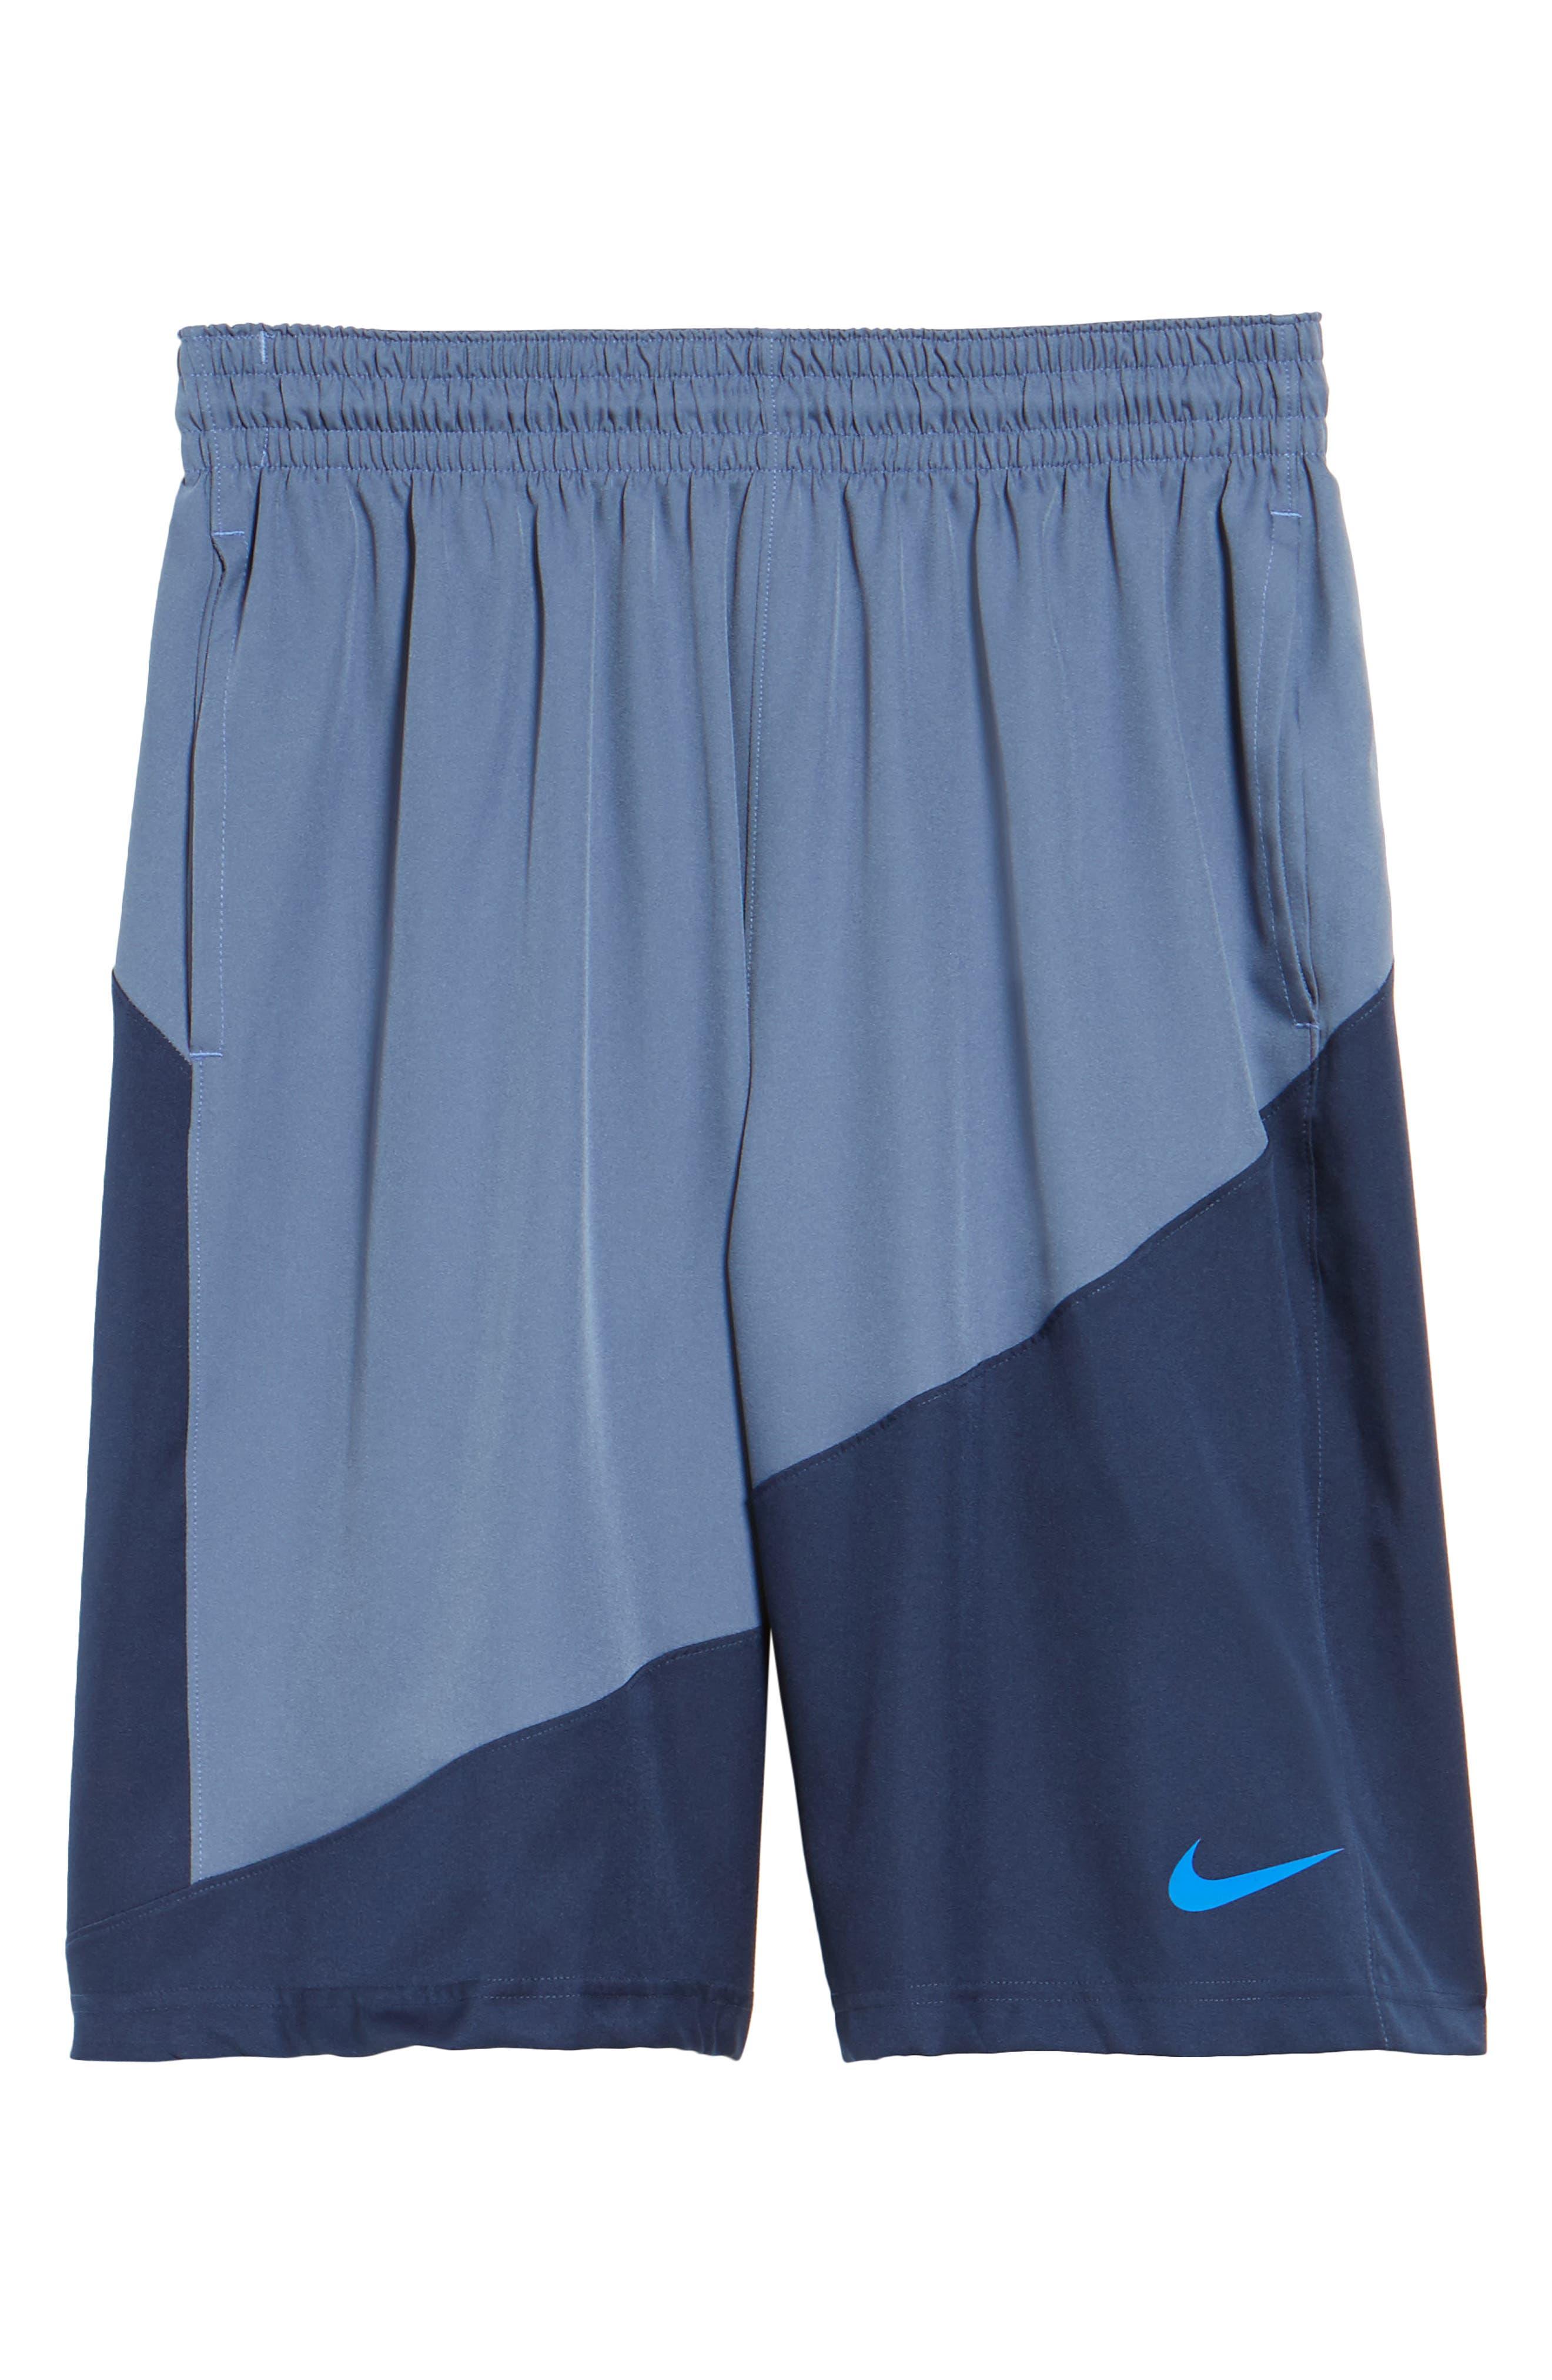 Dry Shorts,                             Alternate thumbnail 18, color,